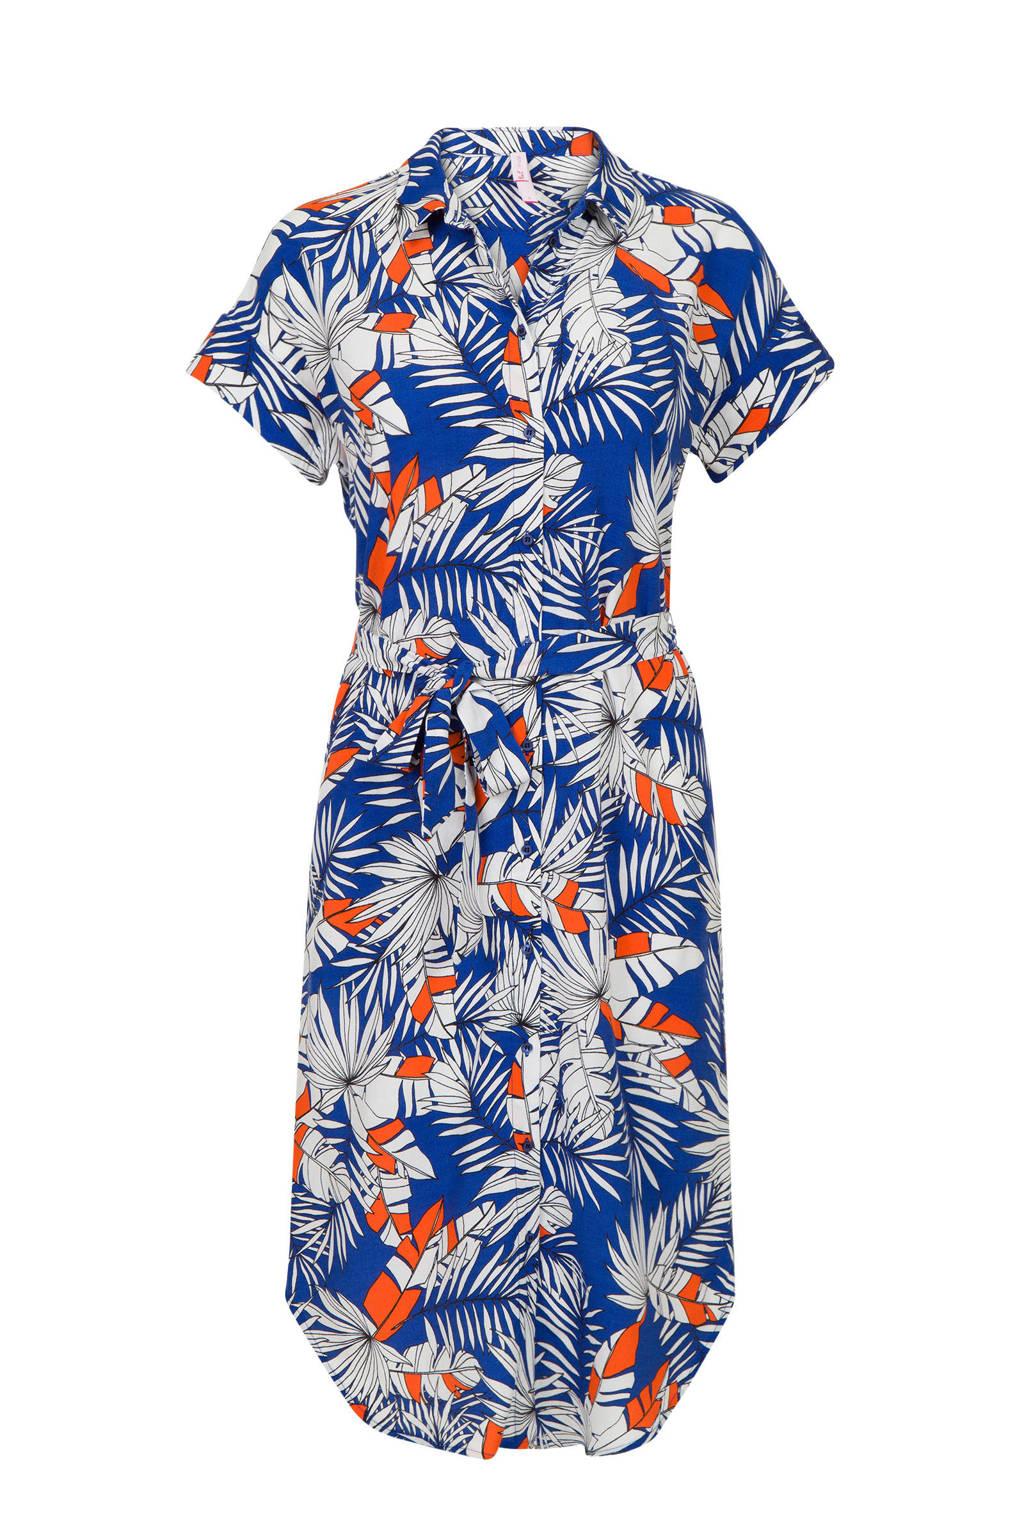 Miss Etam Regulier gebloemde jurk blauw, Blauw/wit